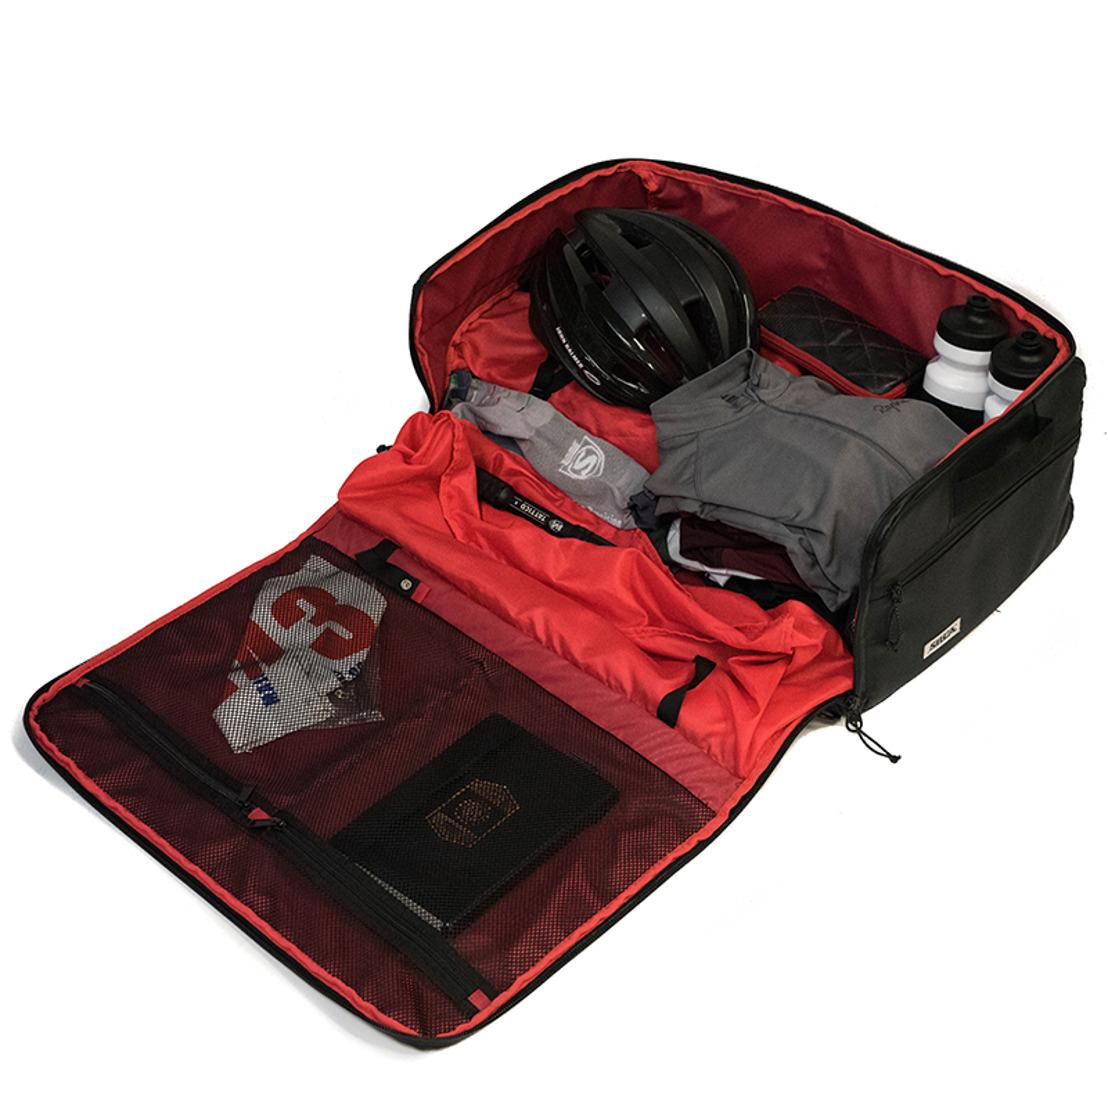 Maratona Gear Bag By Silca